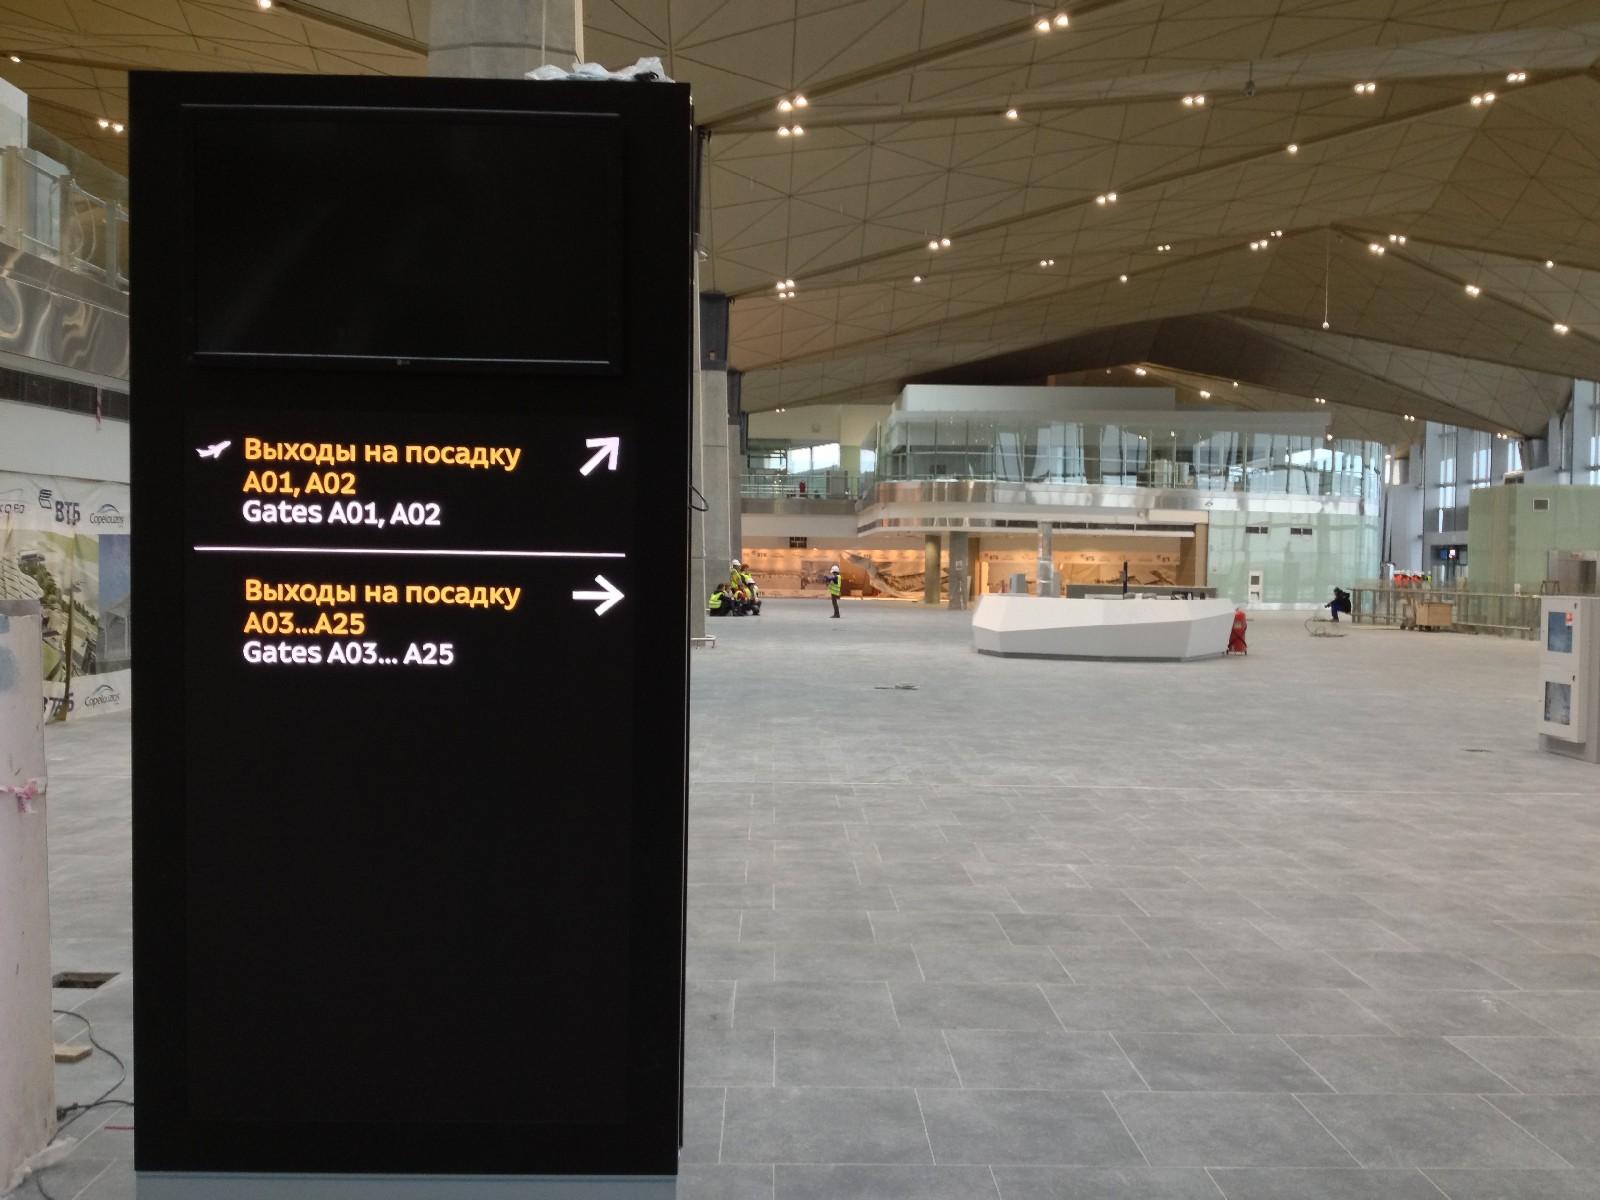 Указатели нового терминала Пулково